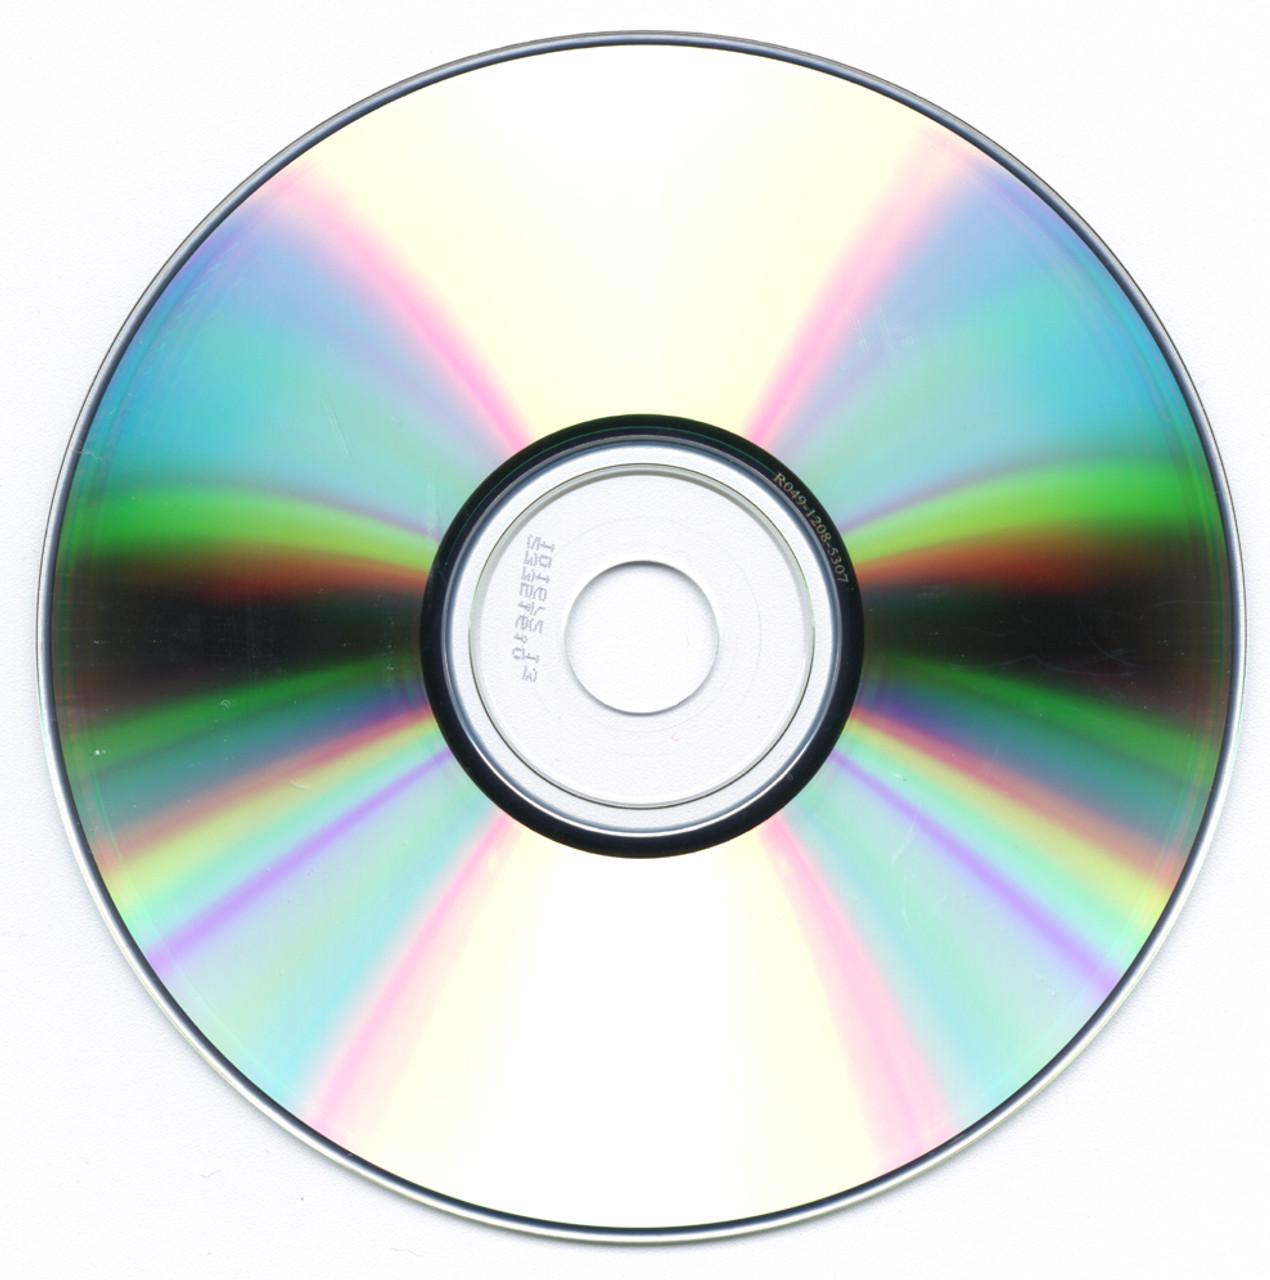 CAS LP1000N Software - Windows XP, Vista & 7